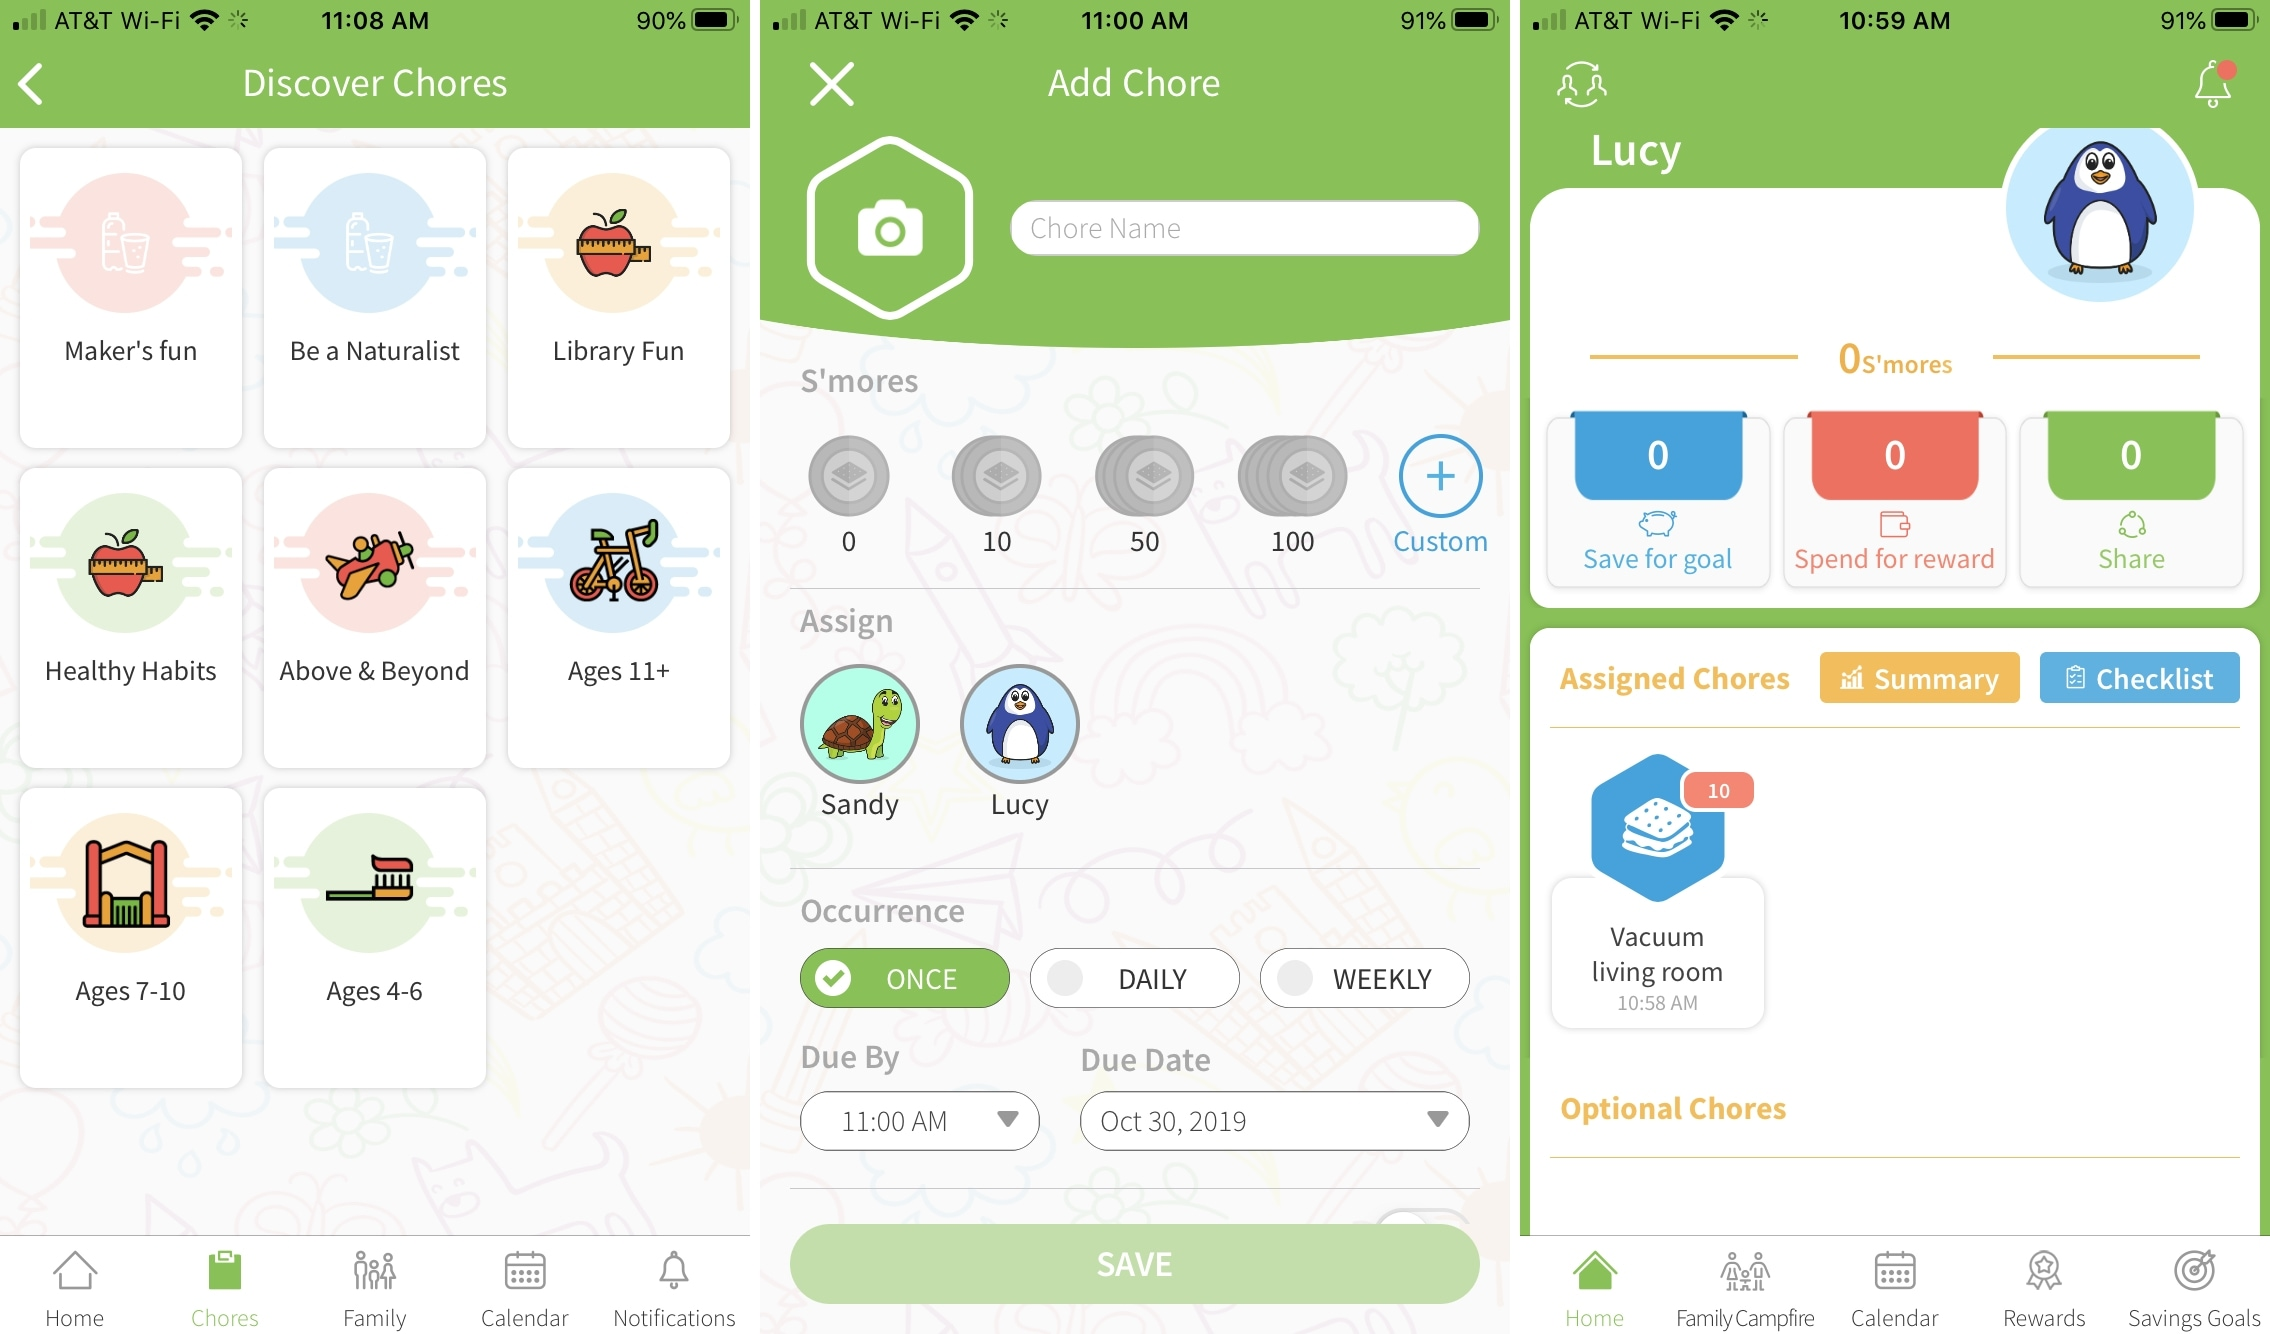 SmoresUp-iPhone-chore-app